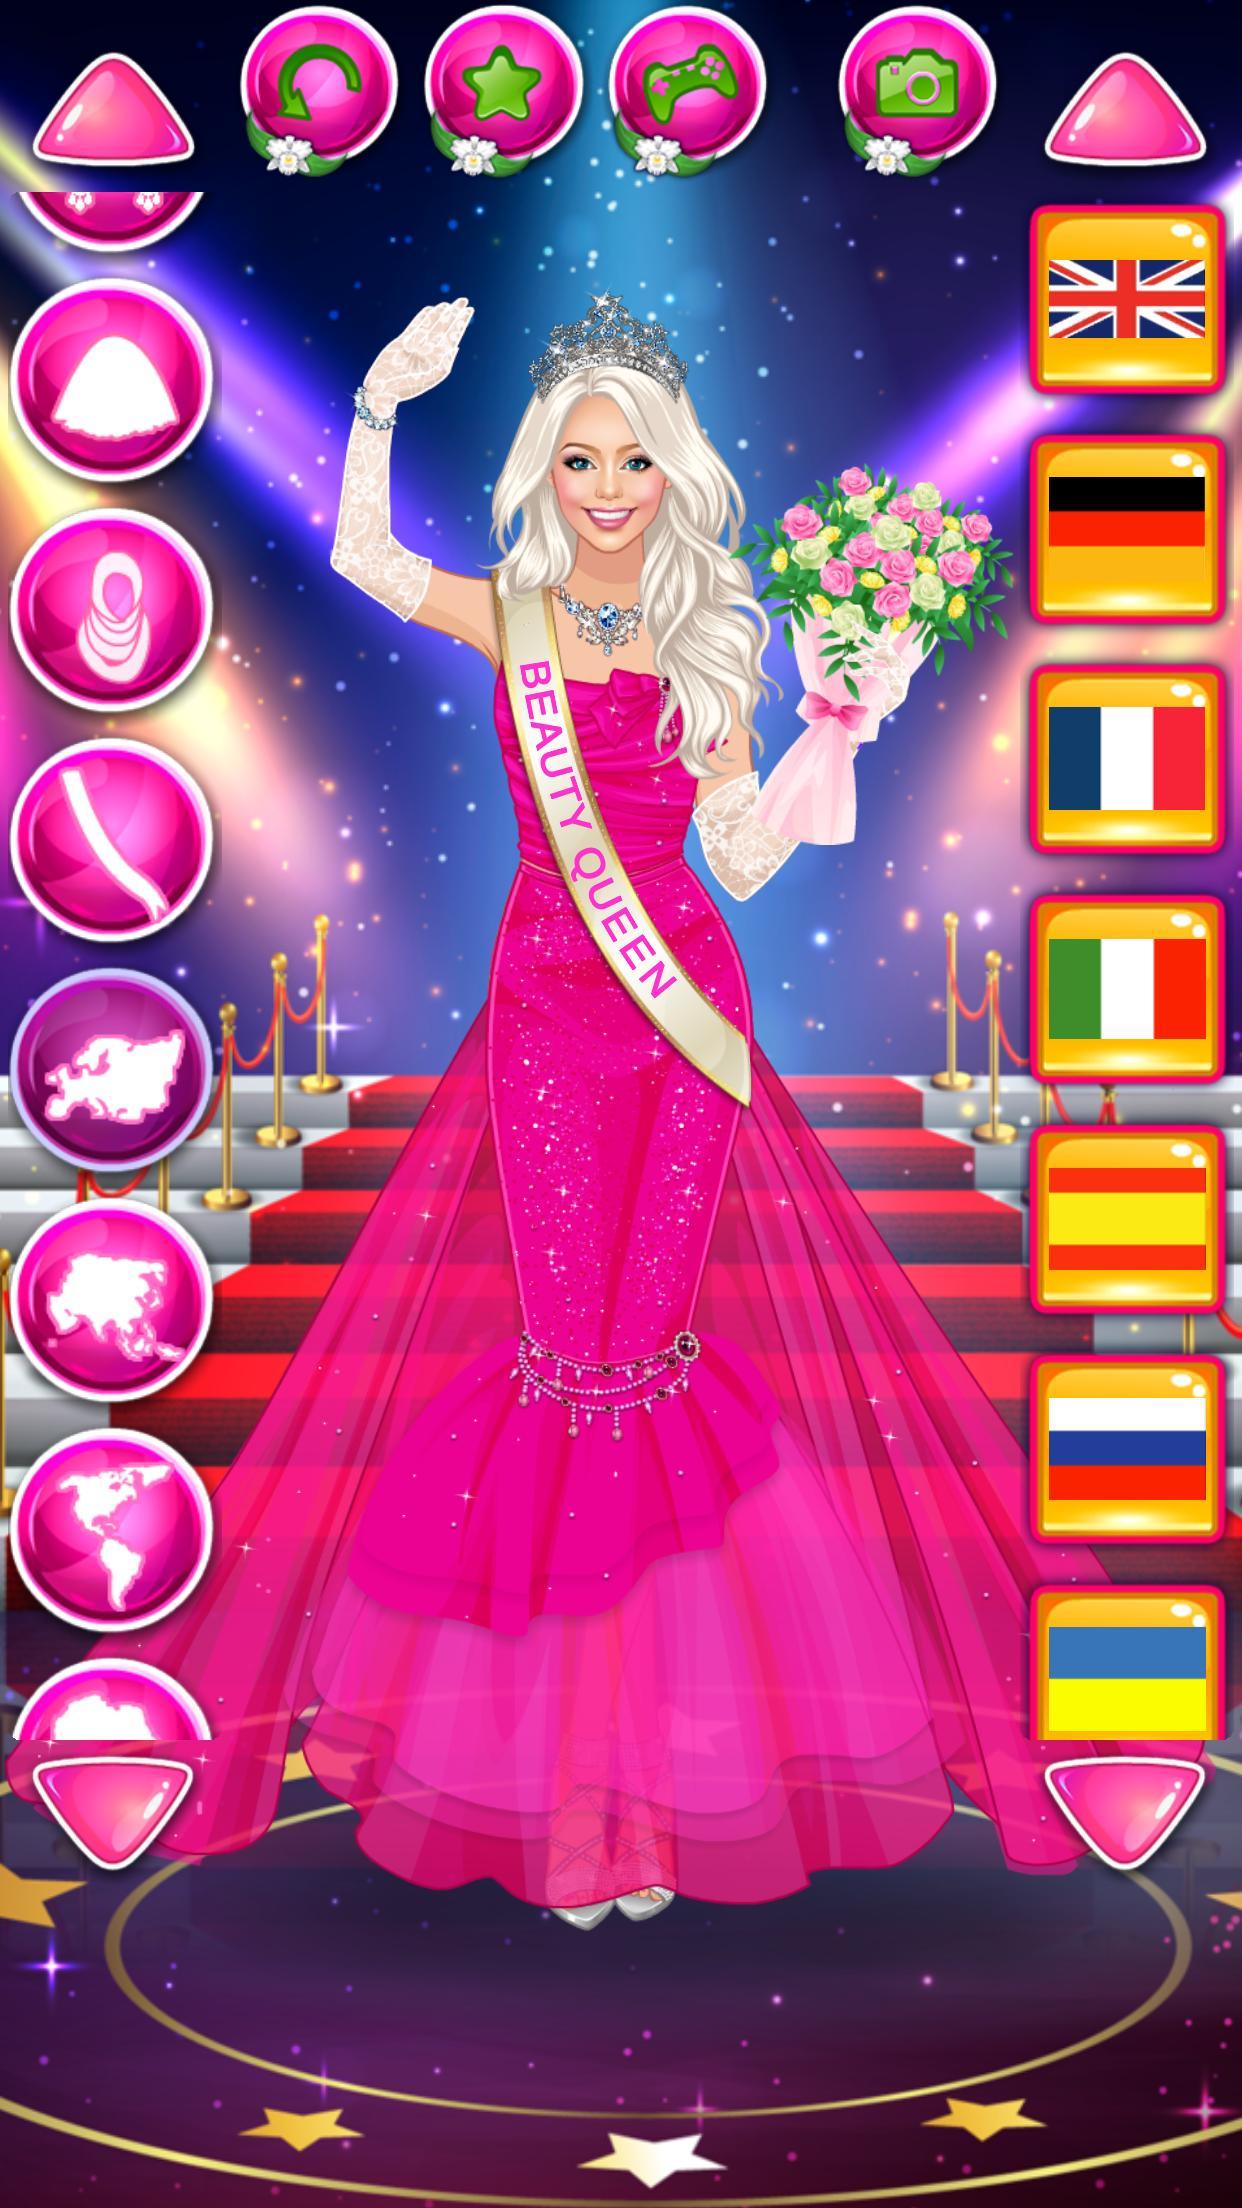 Beauty Queen Dress Up - Star Girl Fashion 1.1 Screenshot 7